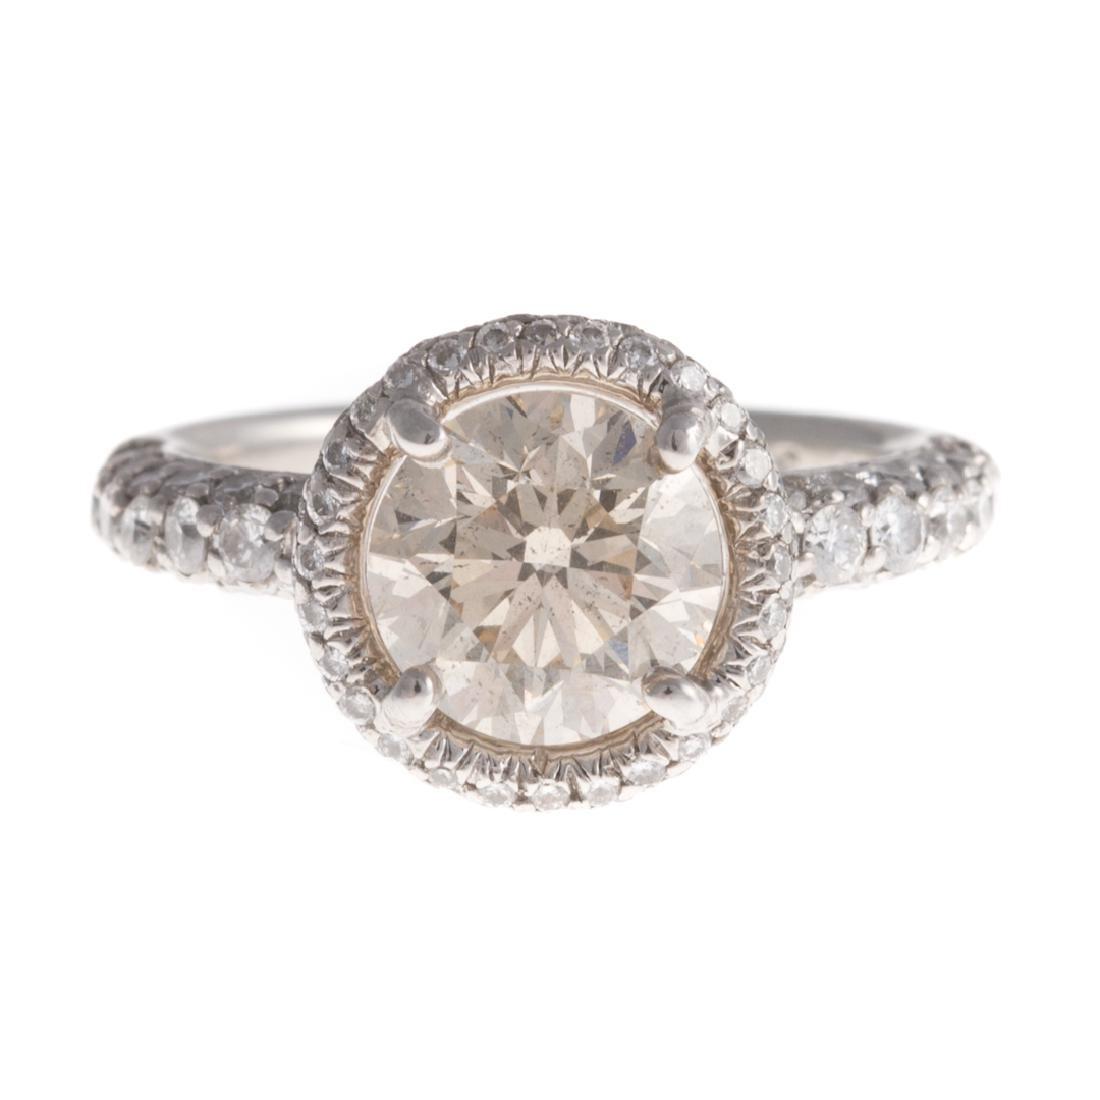 A Lady's Platinum Colored Diamond Ring